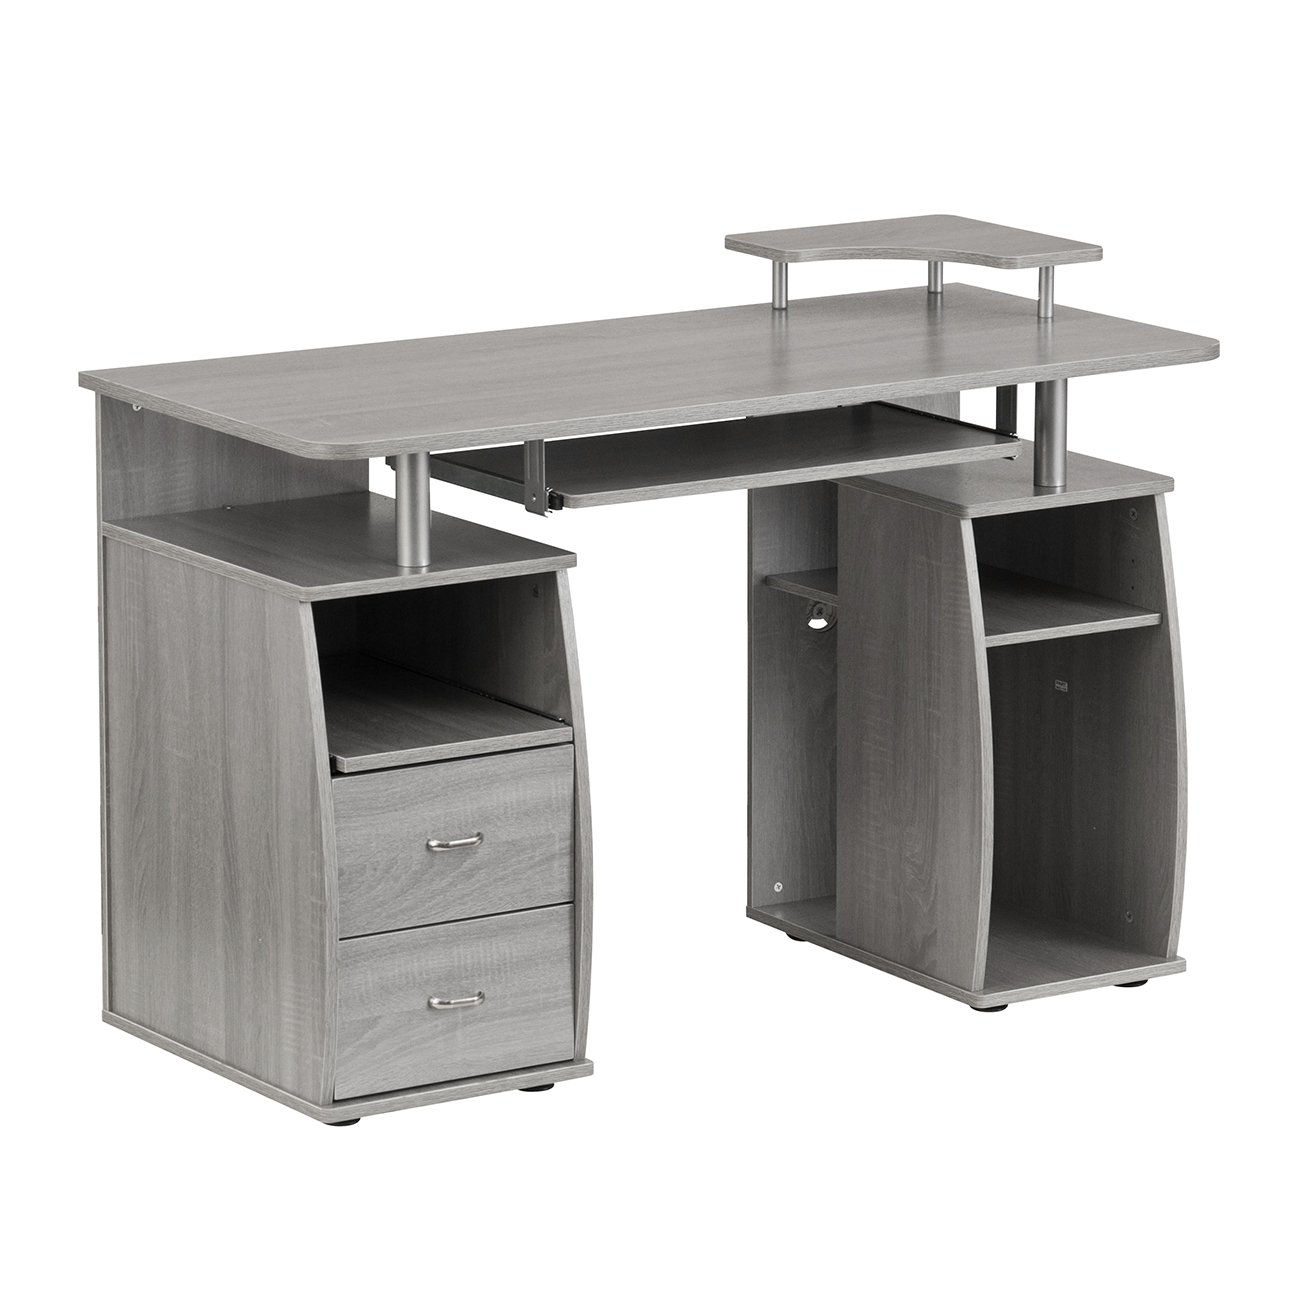 Techni Mobili Complete Computer Workstation Desk Grey/Grey/Rectangle